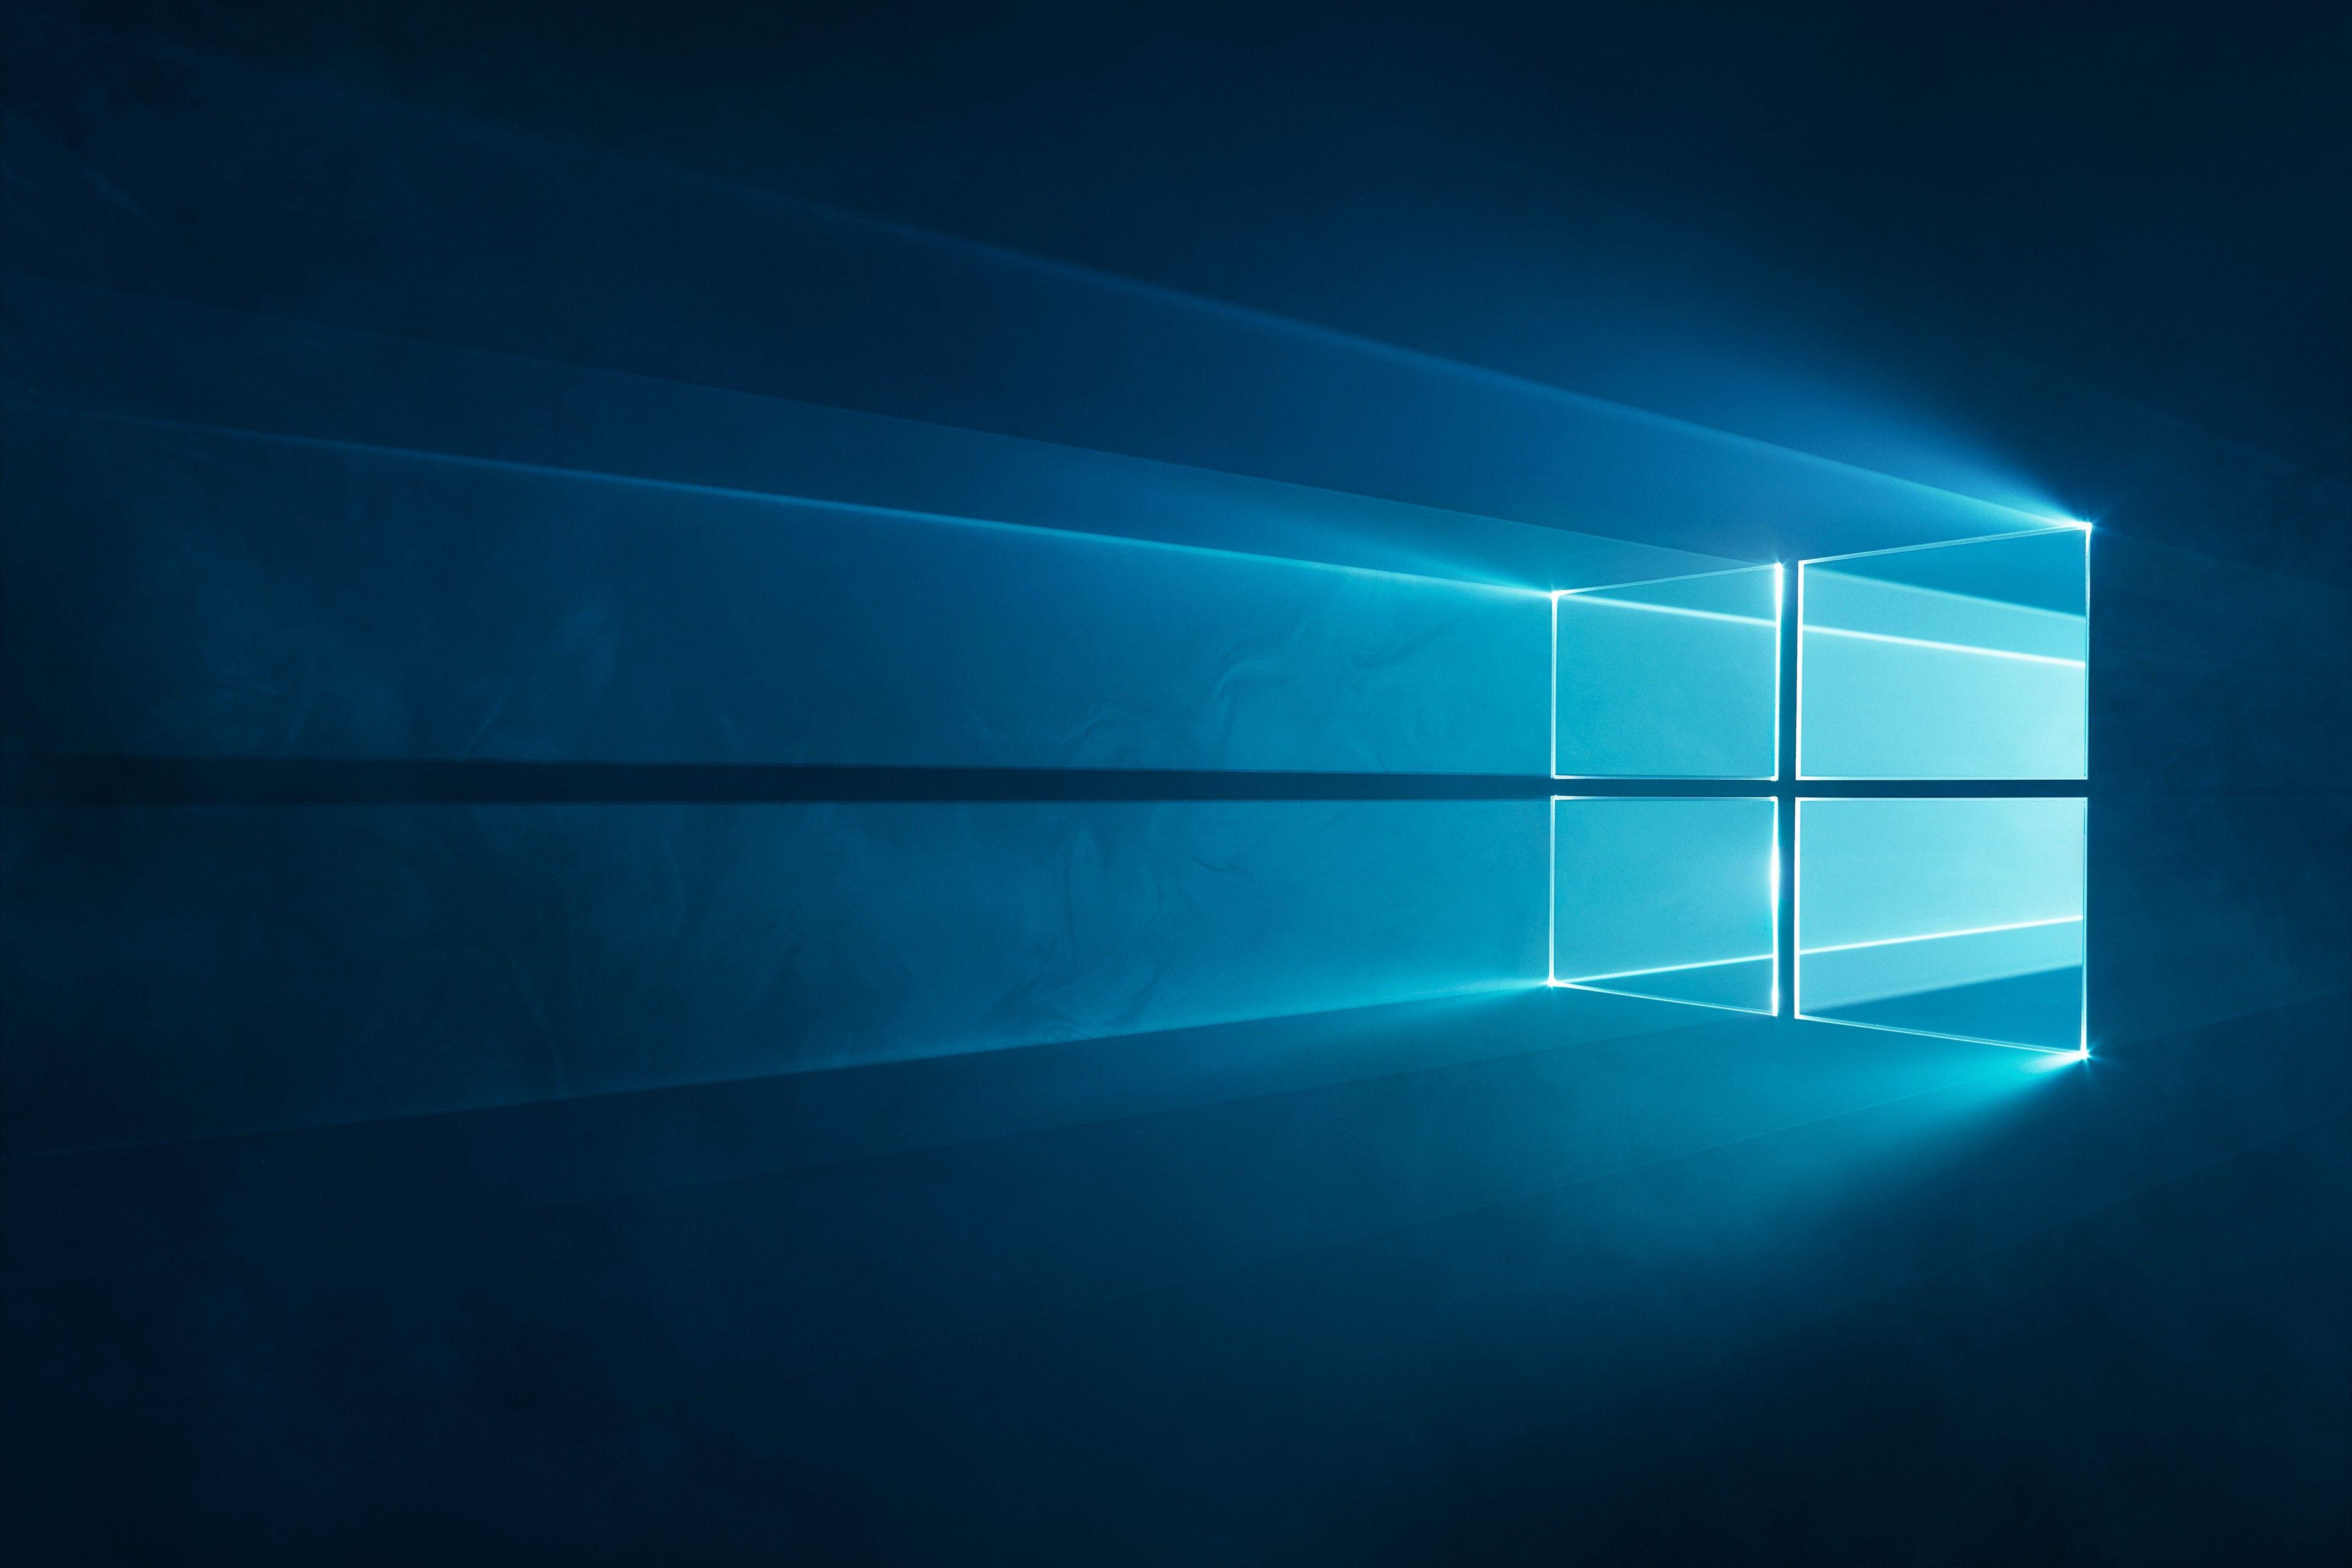 Lovely Desktop Hd Wallpapers For Windows 10 Windows 10